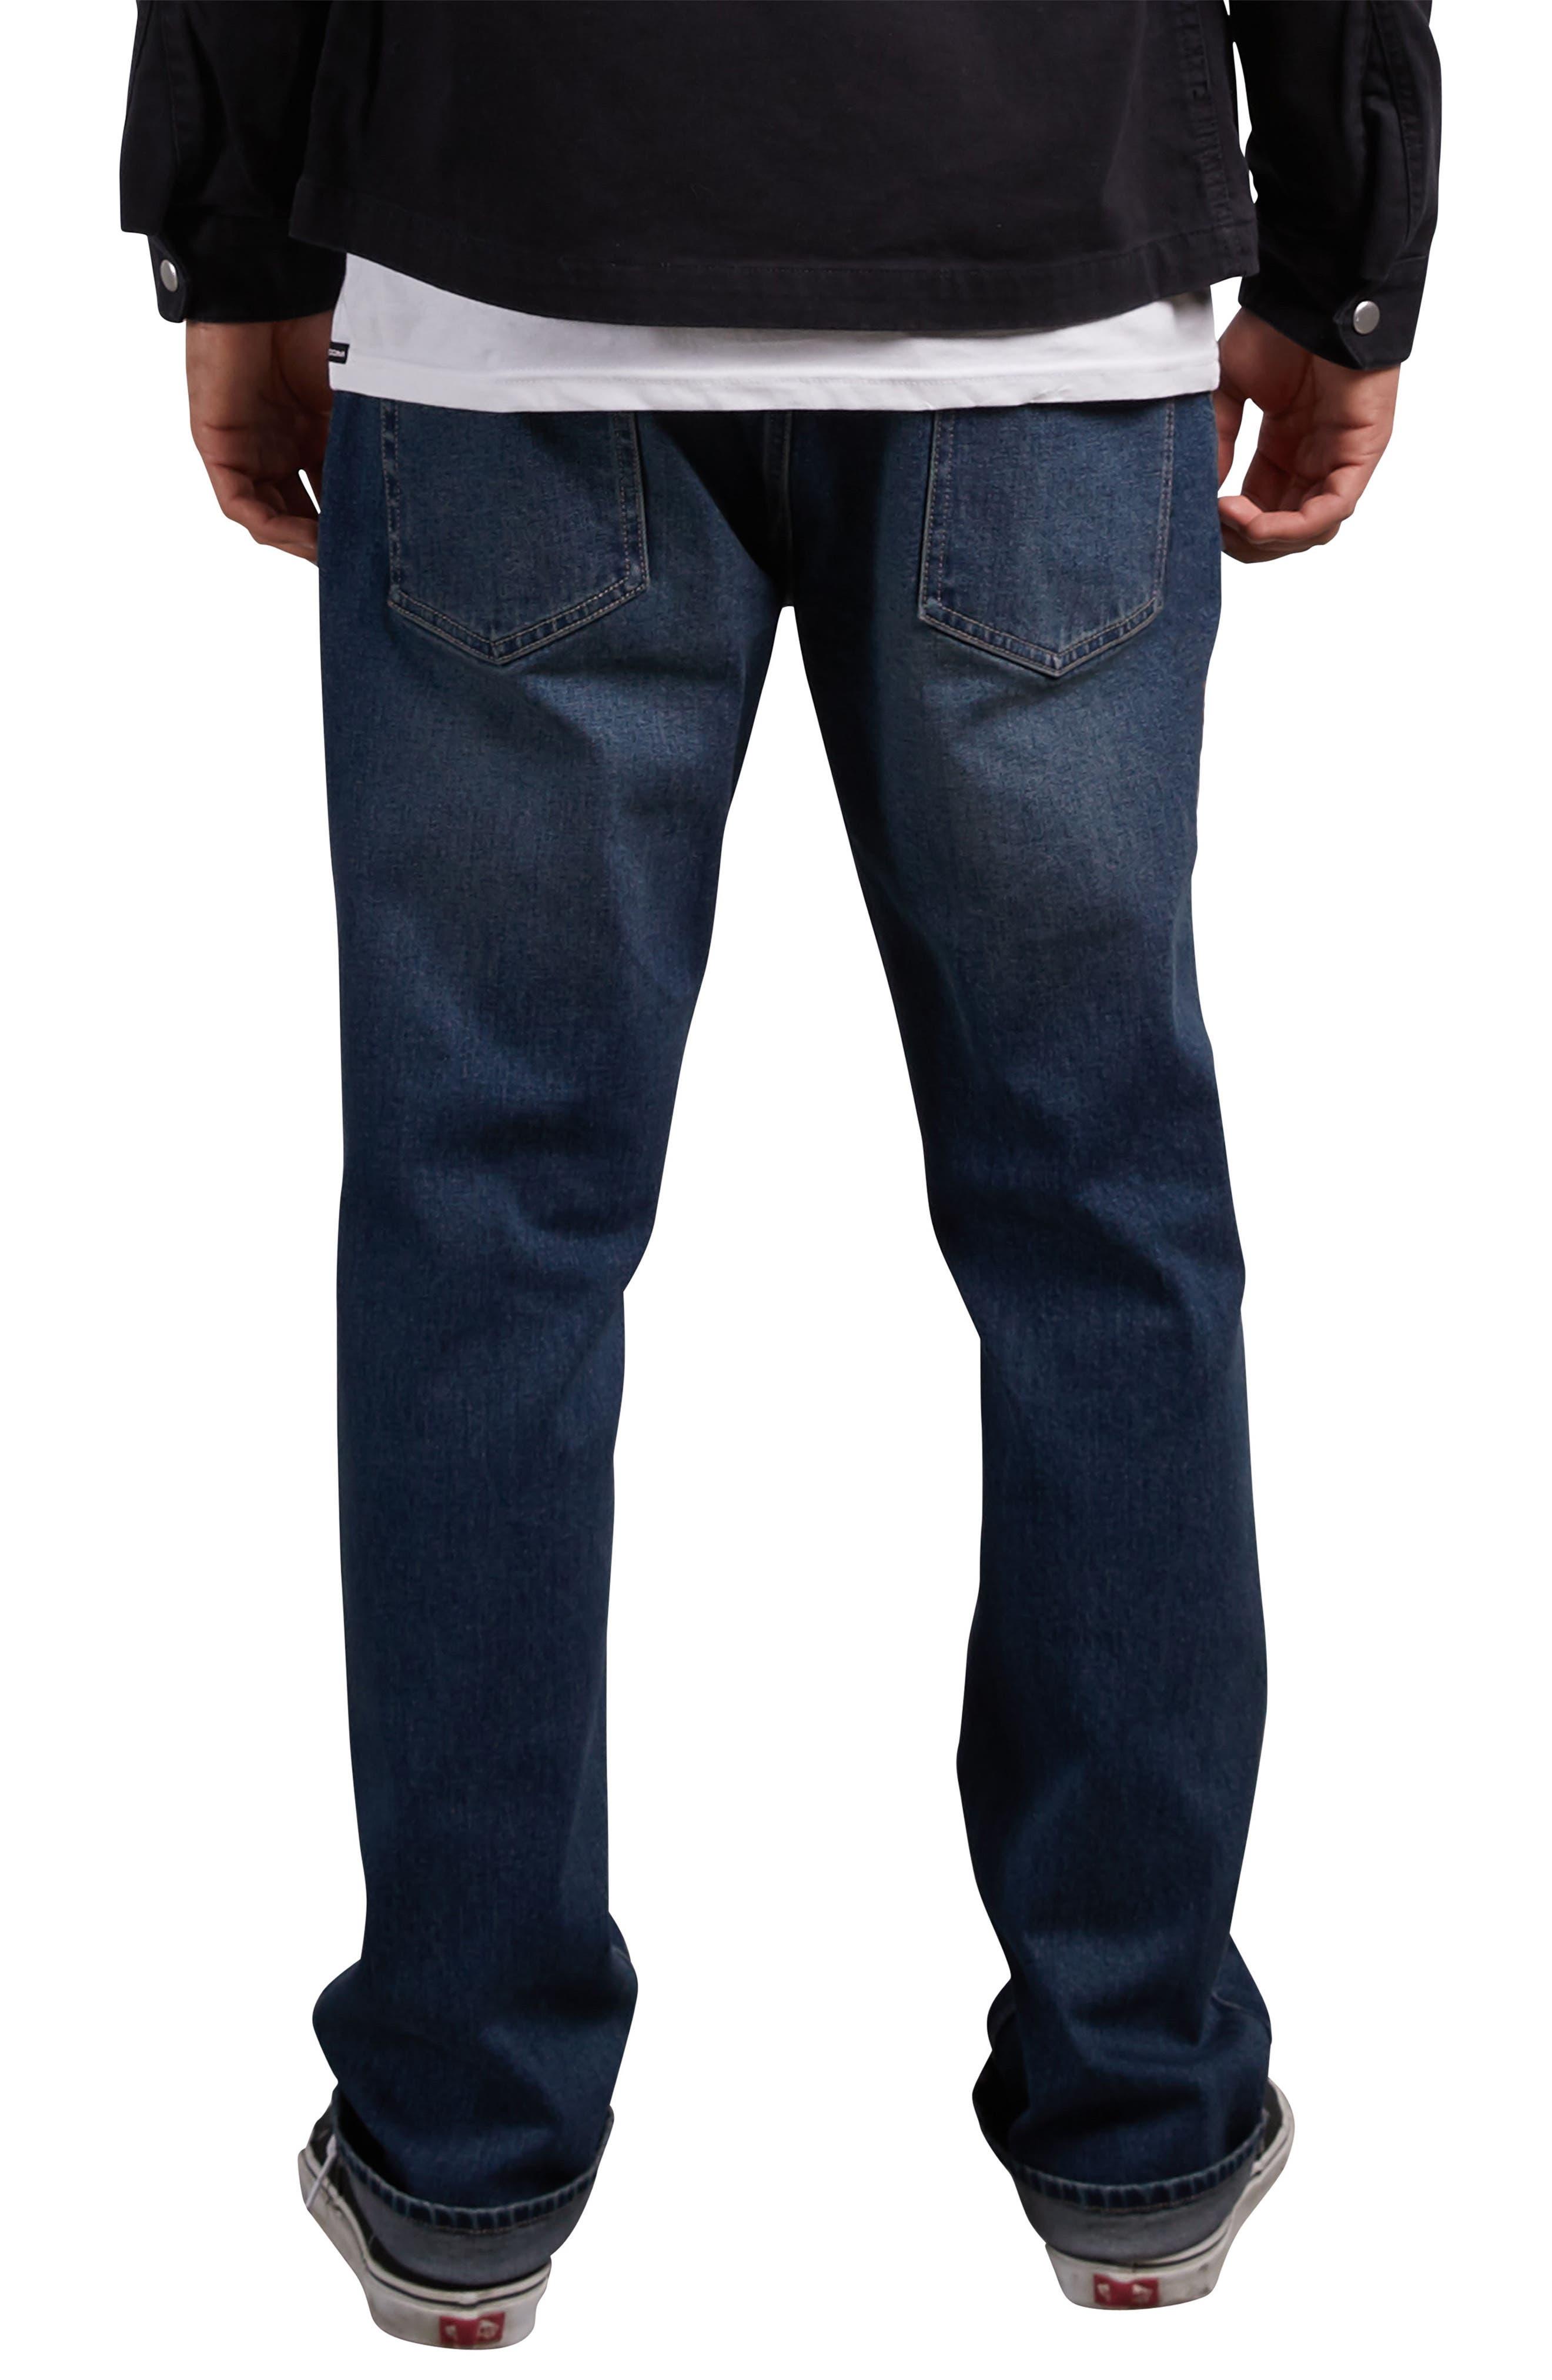 Kinkade Tapered Leg Jeans,                             Alternate thumbnail 2, color,                             BLUE DRY